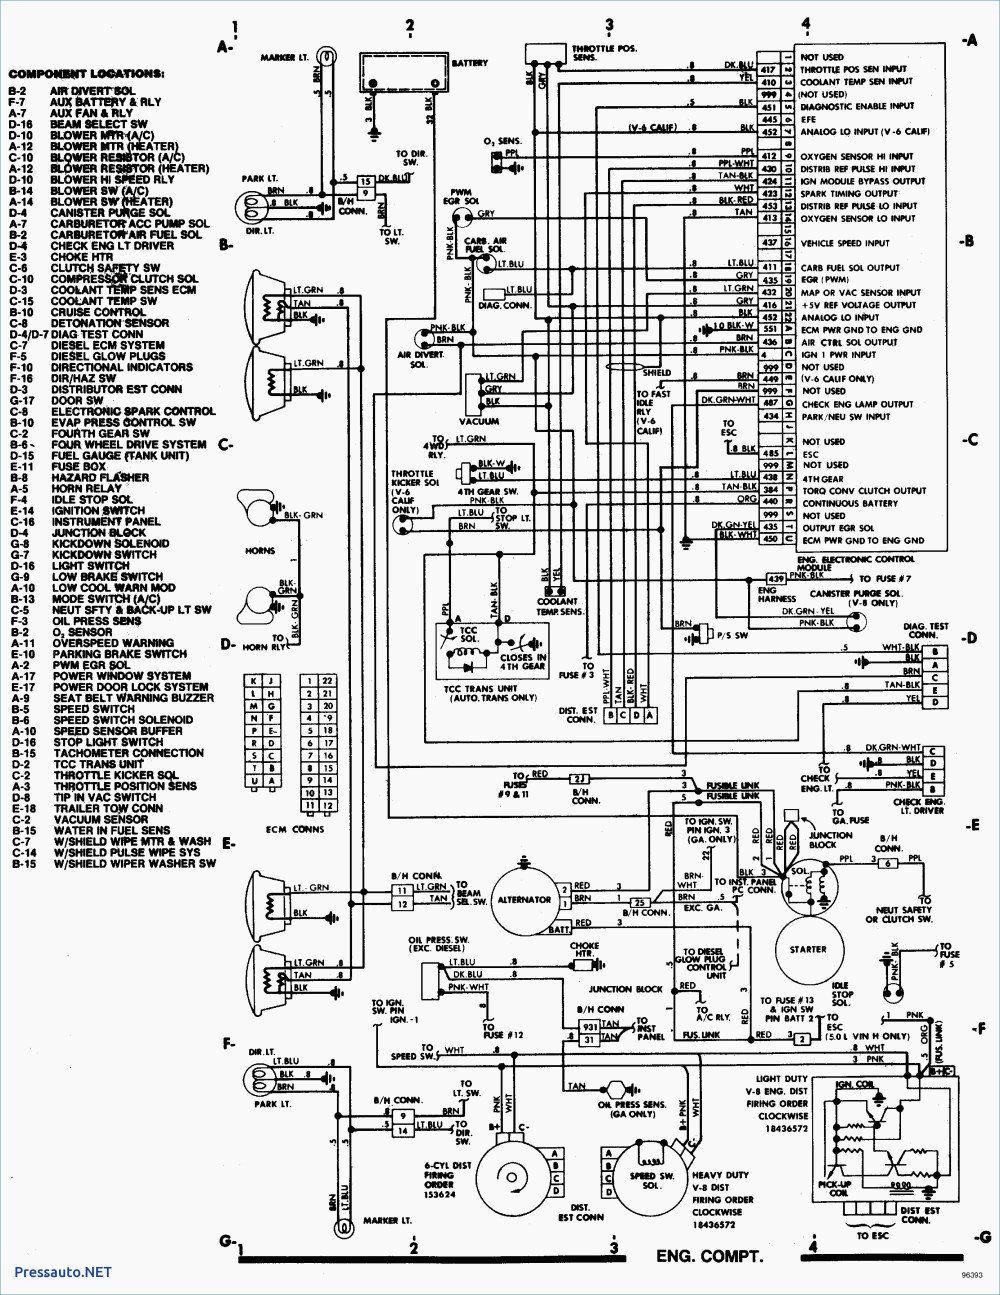 medium resolution of 1983 toyota pickup wiring diagram best 1990 toyota pickup wiring diagram contemporary everything you of 1983